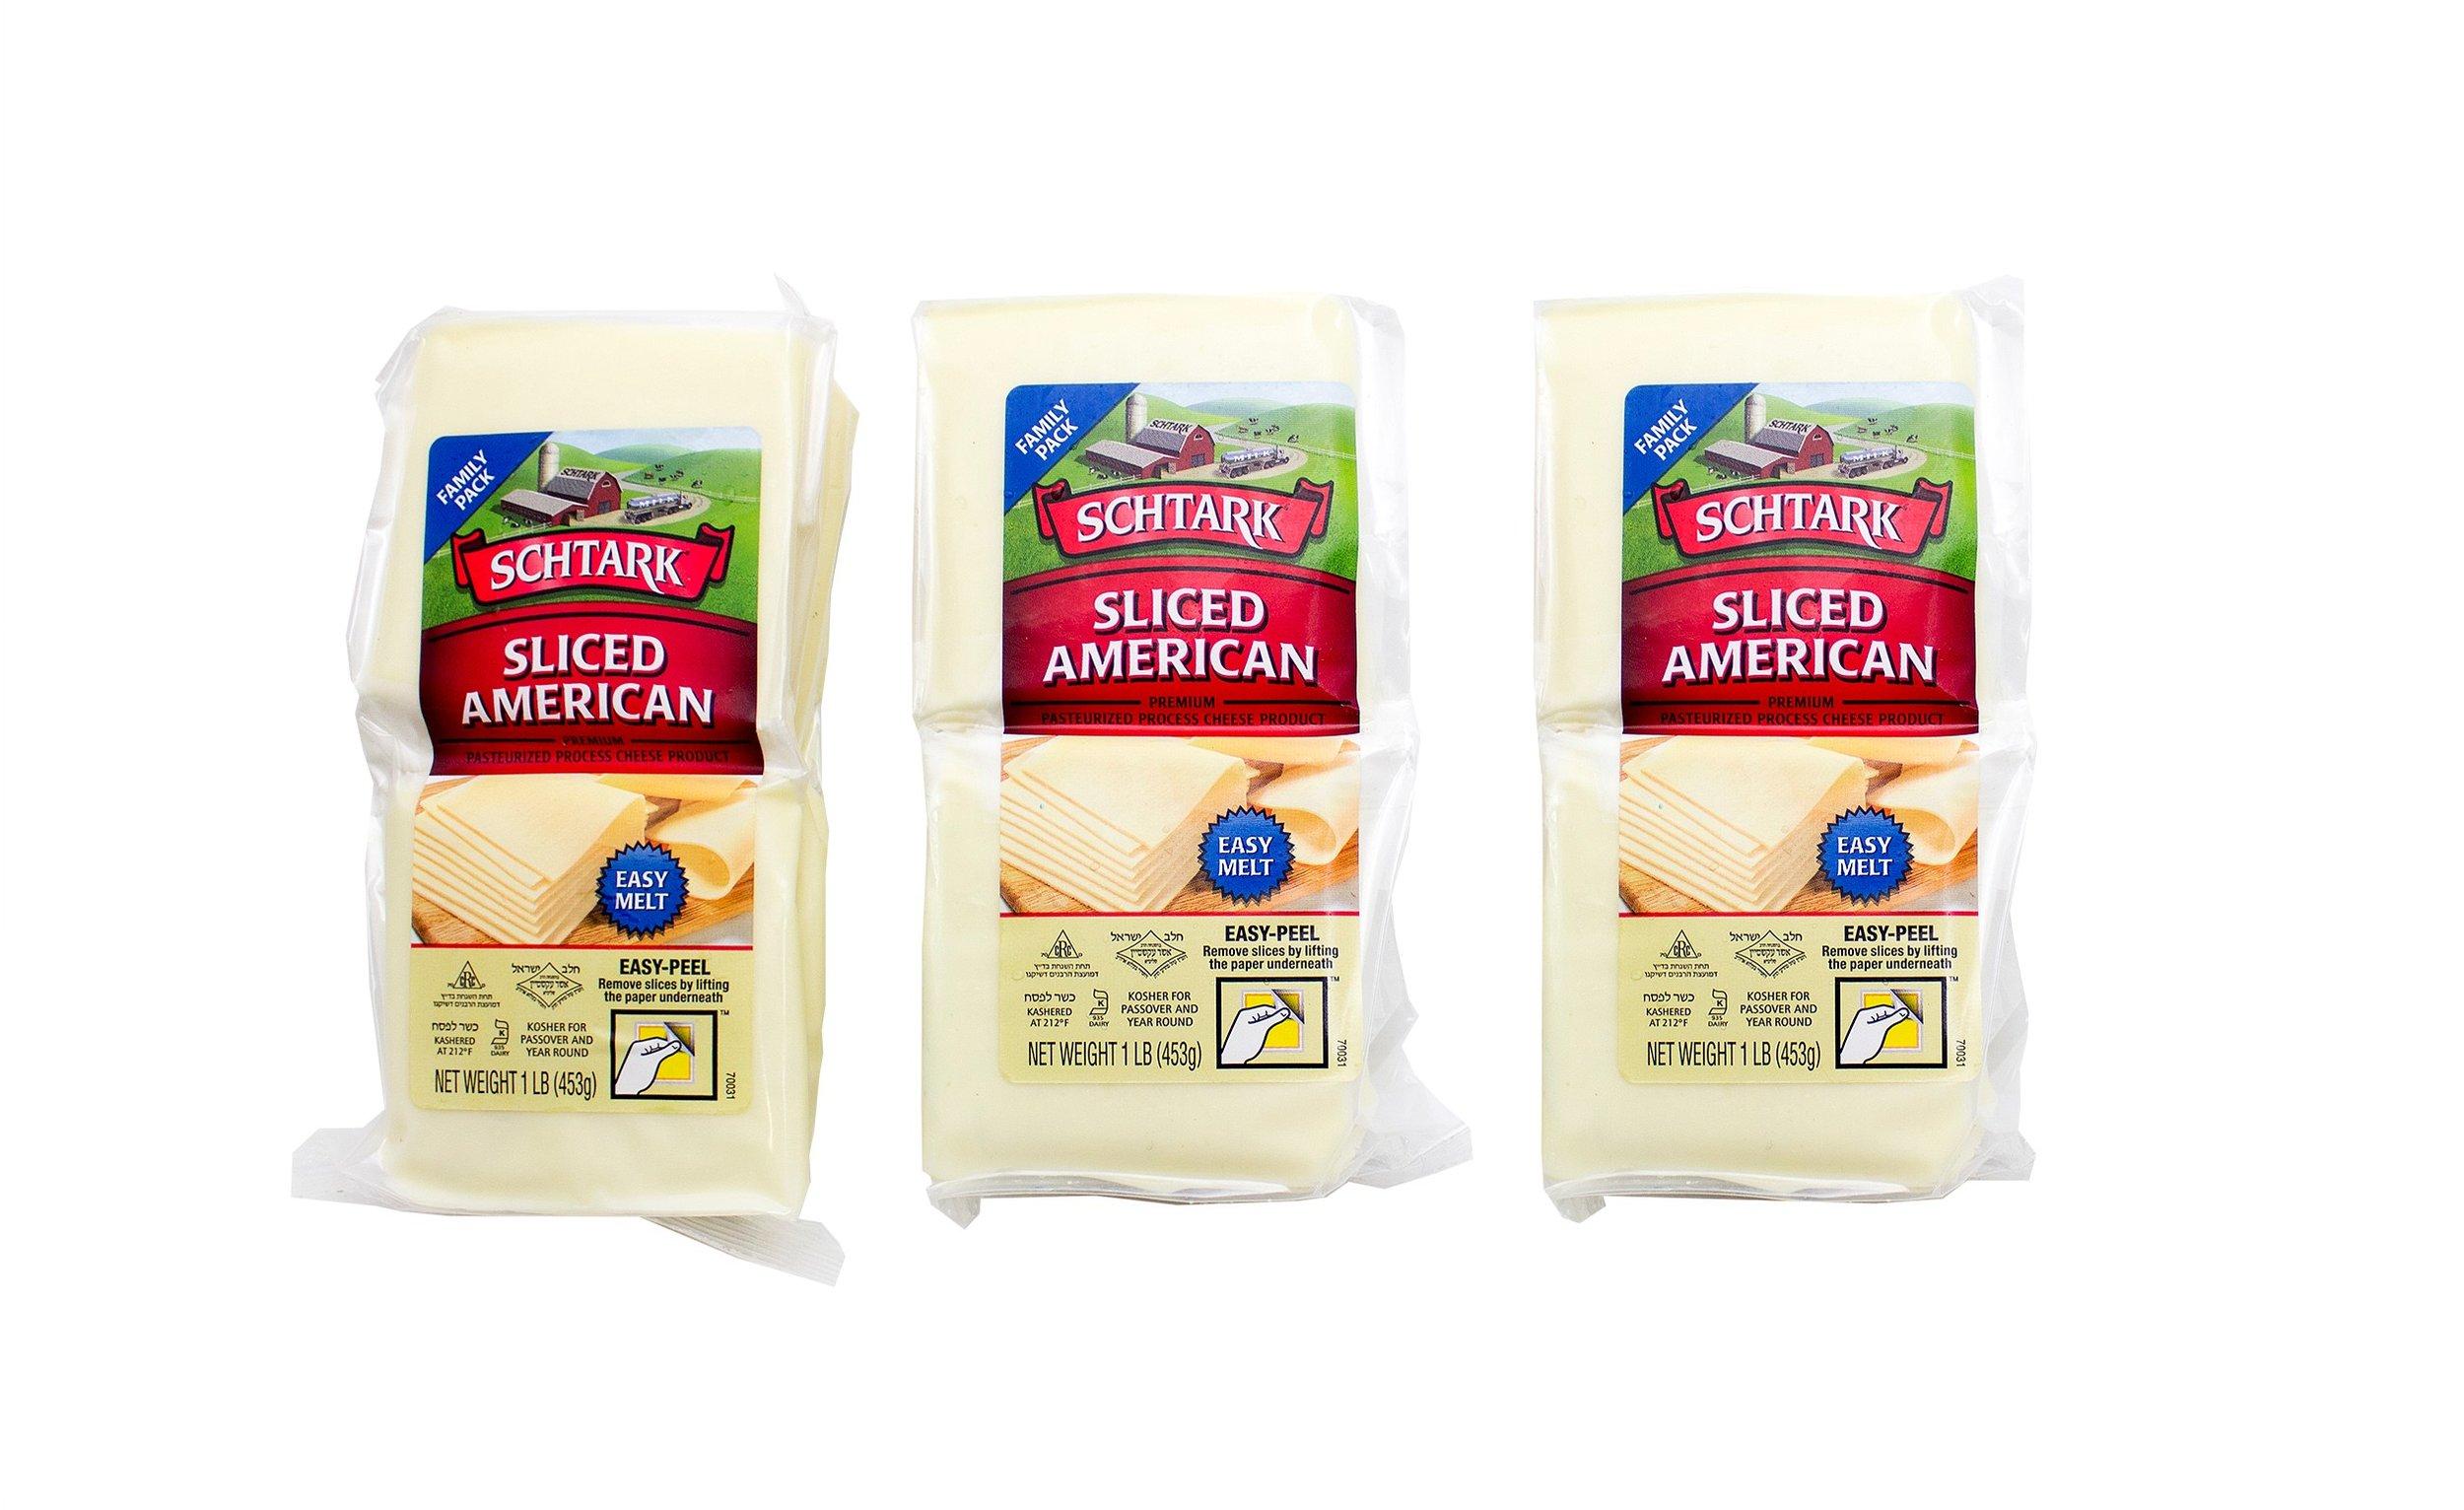 Schtark Super Kosher Cheese American Slices                        1 Pound (Pack of 3)